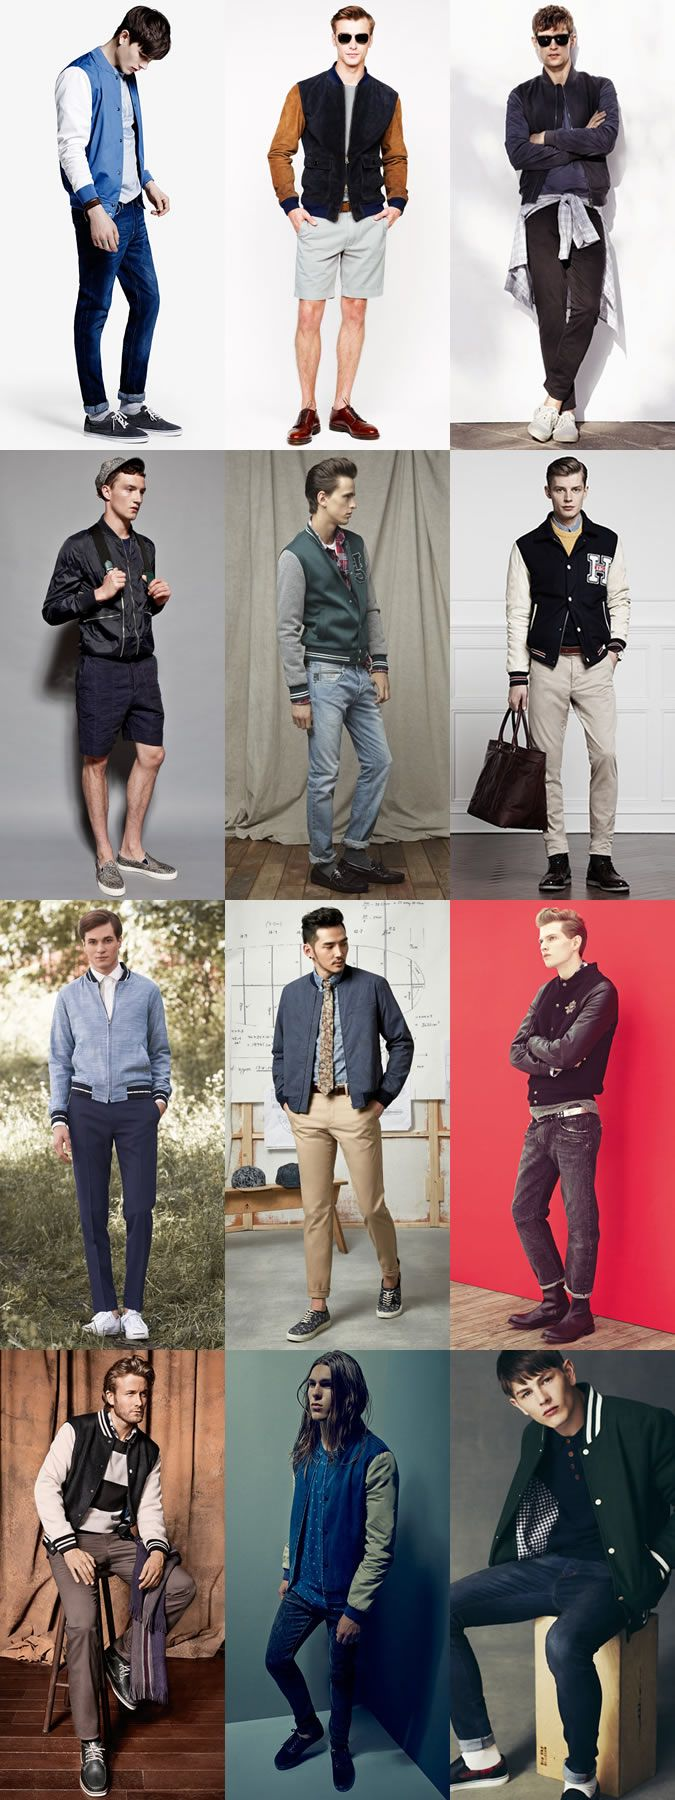 9ee9875cd5d5 Men s Varsity Baseball Jacket Outfit Inspiration - Americana-Inspired  Lookbook  mens  fashion